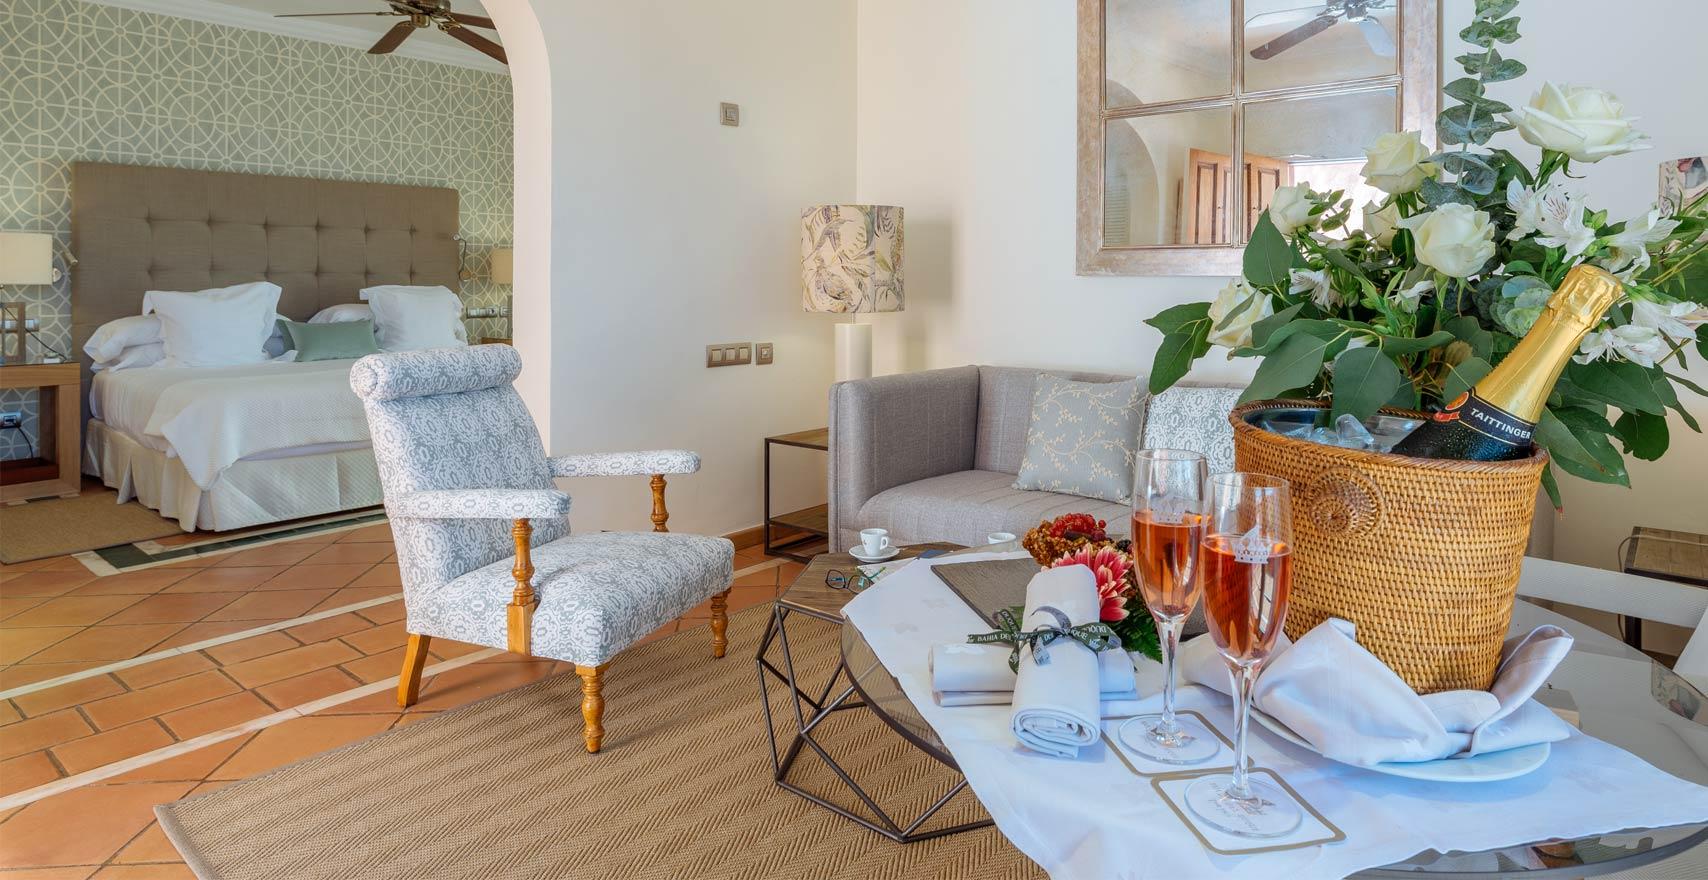 Suite Casas Ducales living room3